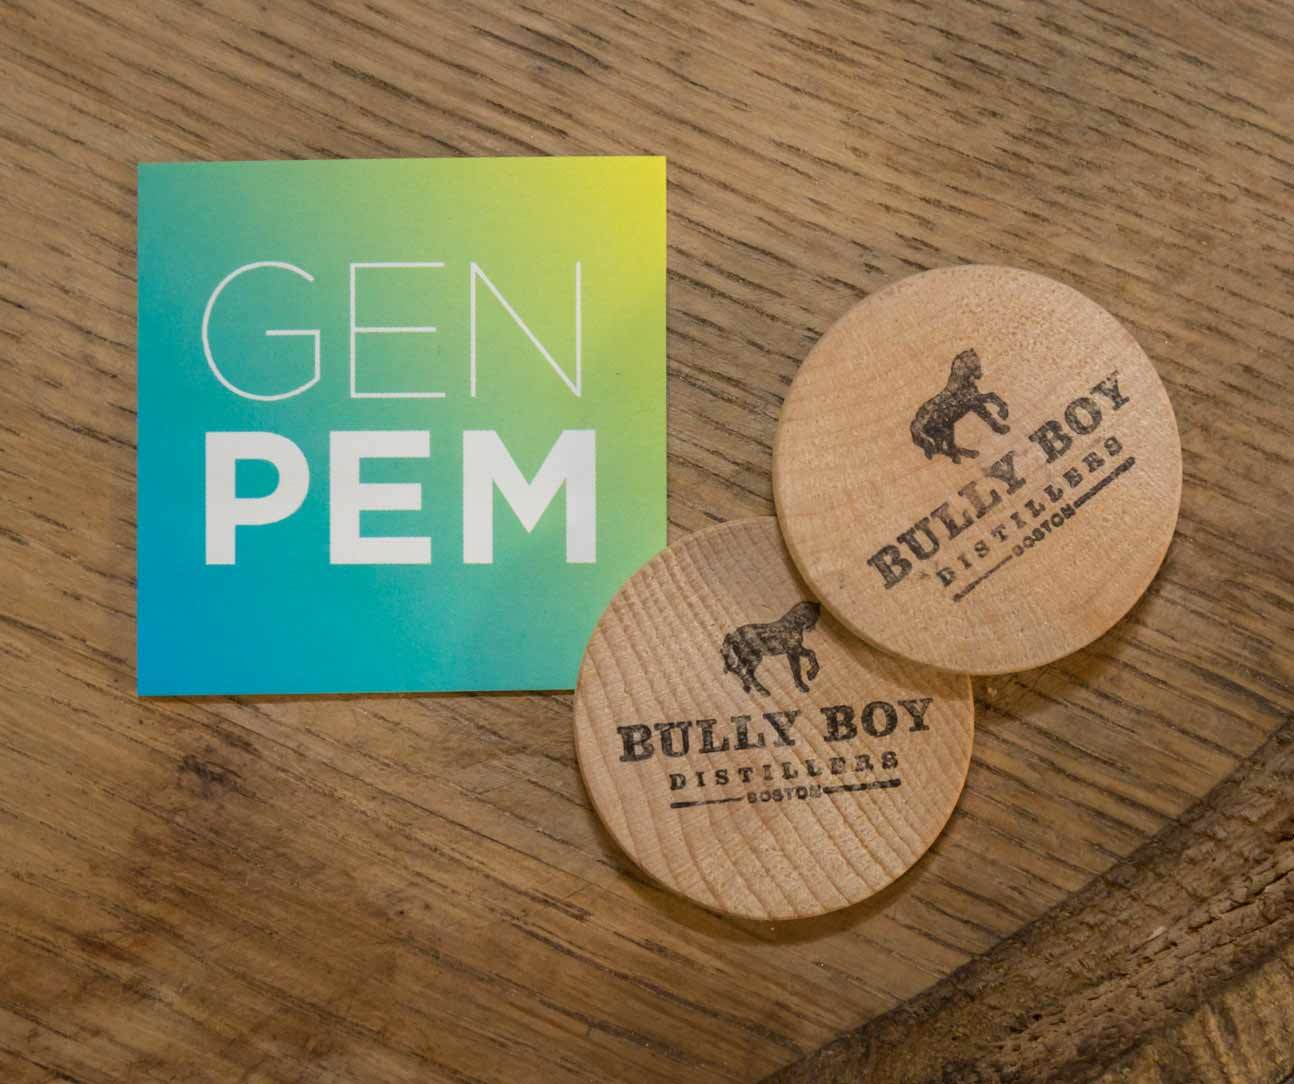 GenPEM at Bully Boy Distillers